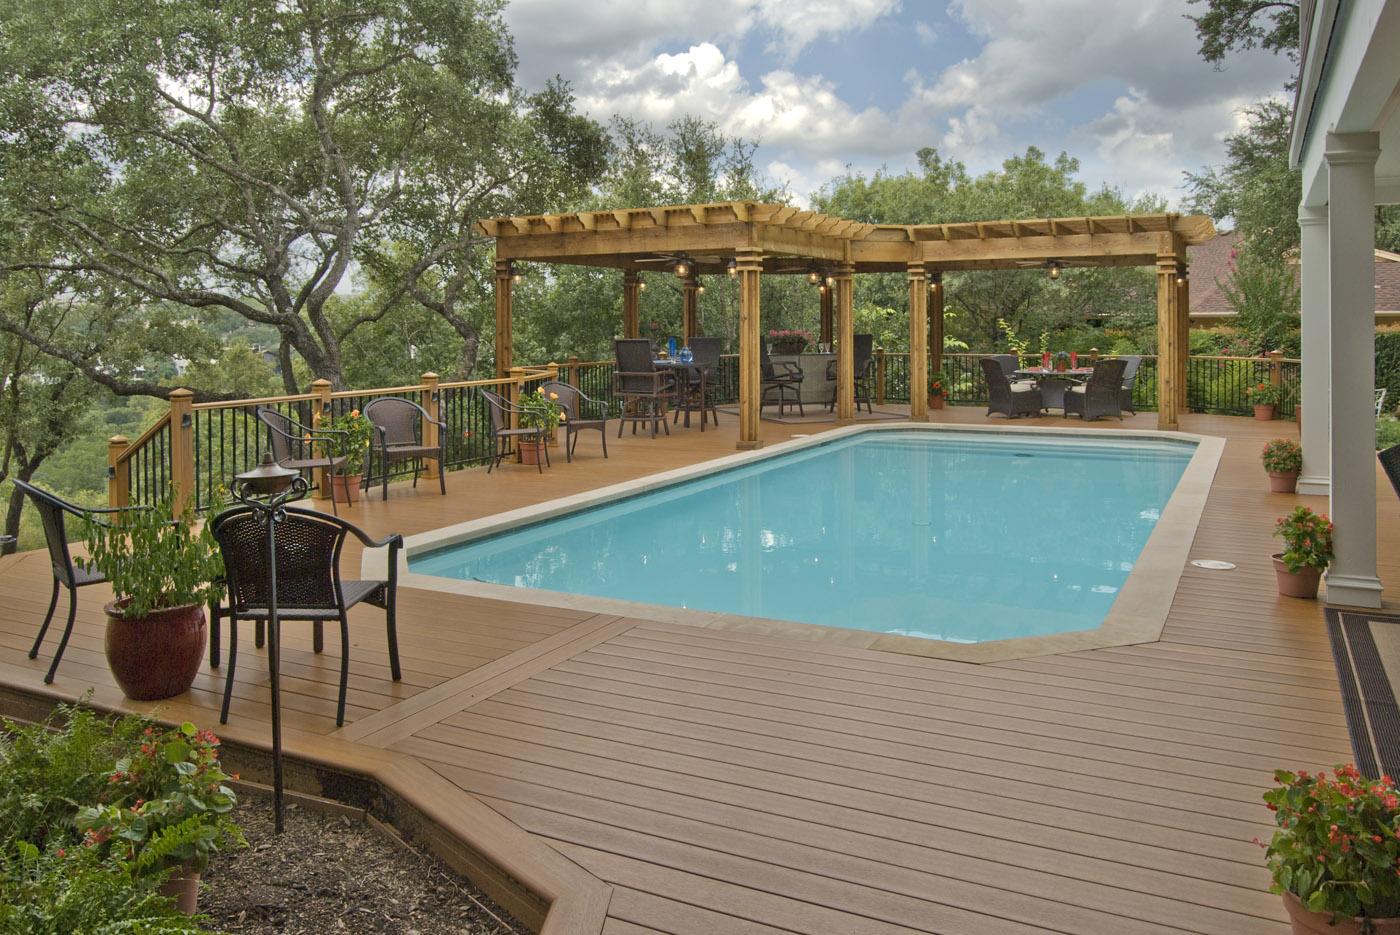 AZEK Pool Deck